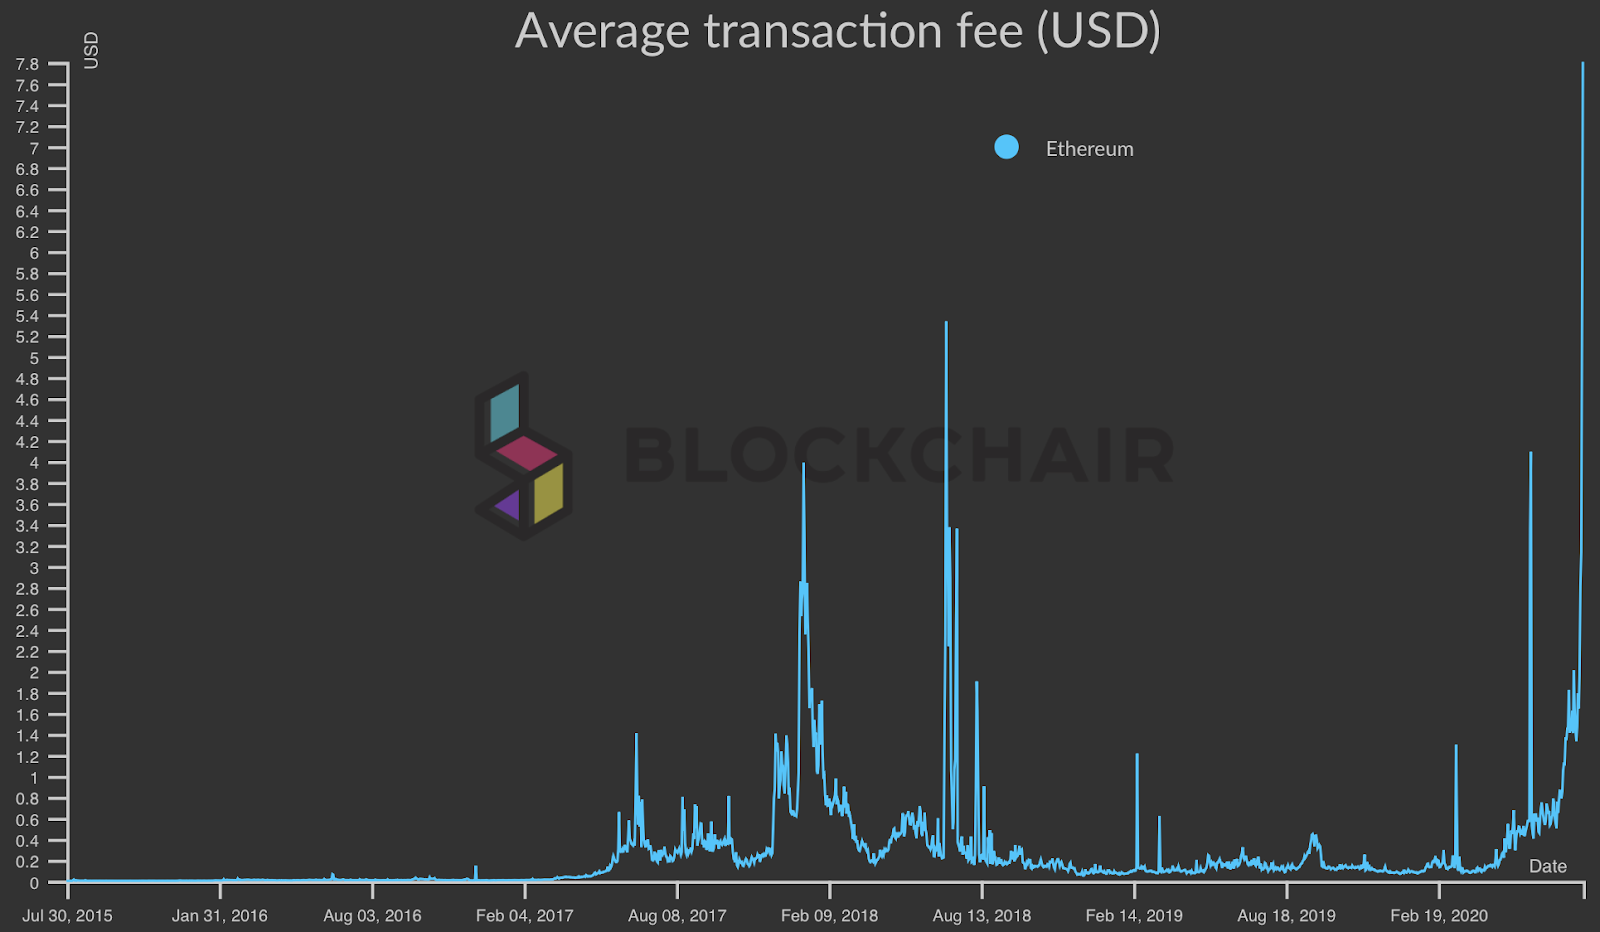 Средняя комиссия за транзакцию Ethereum на графике USD